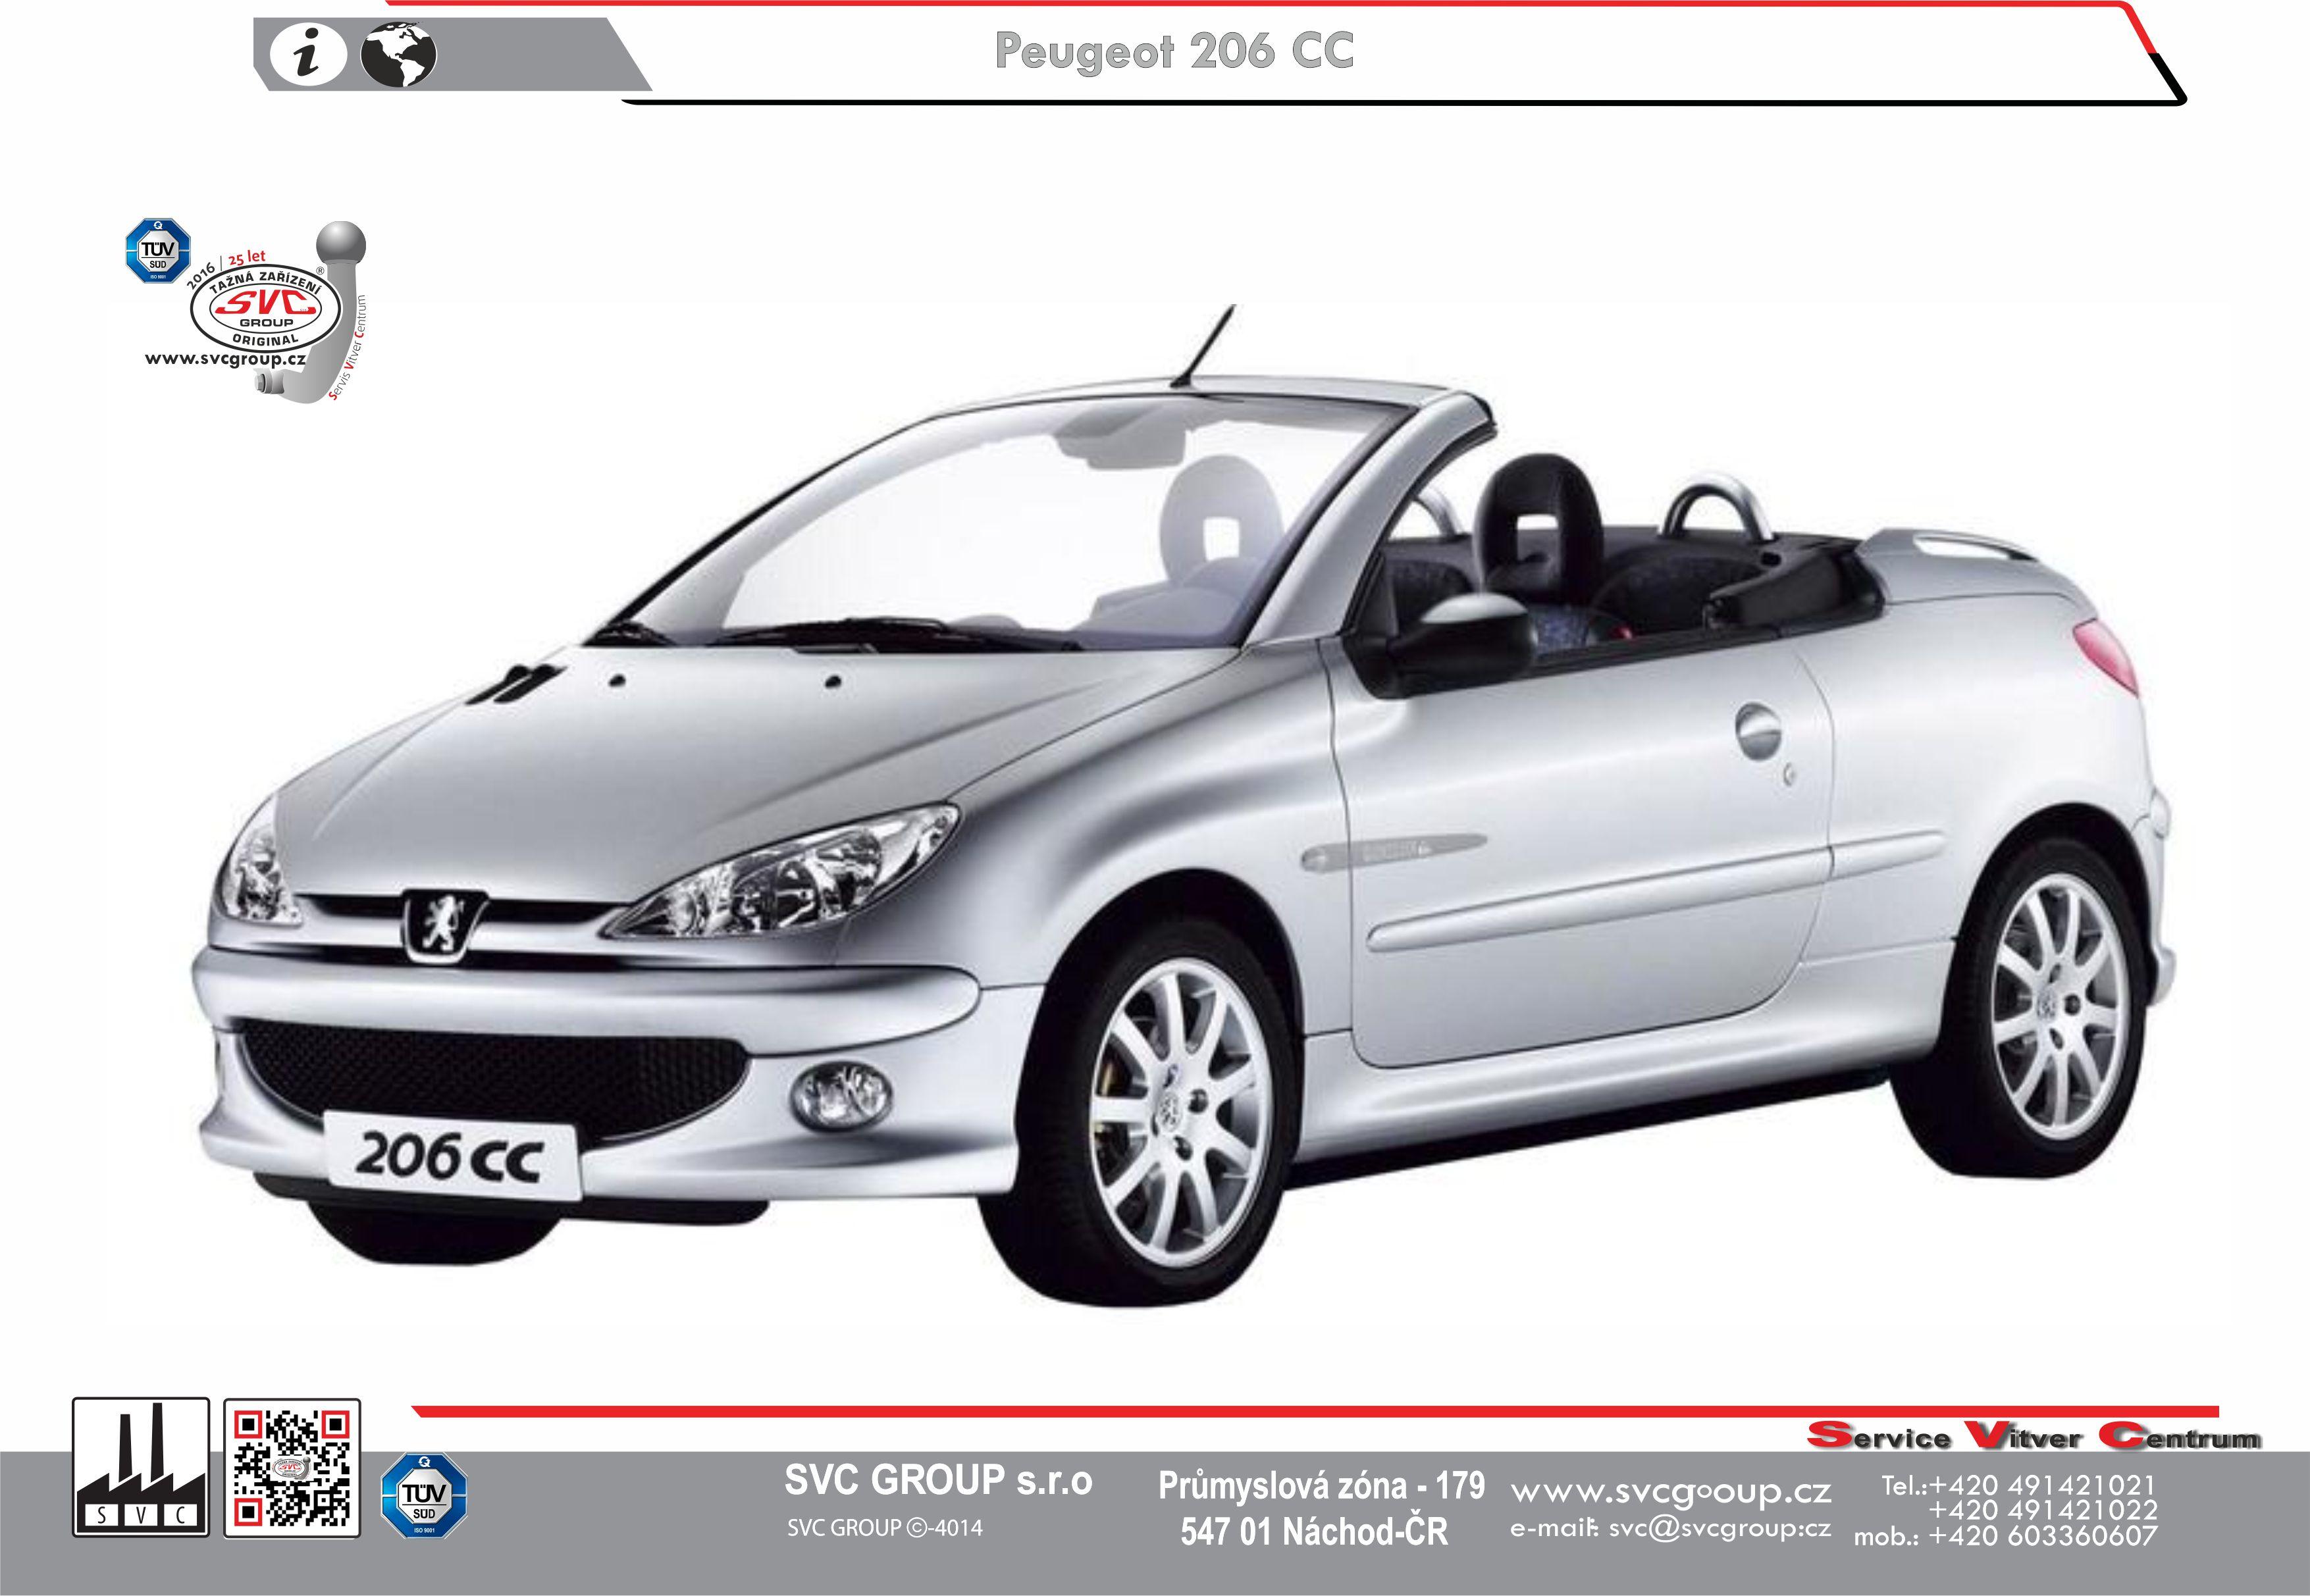 Peugeot 206 CC - Kabriolet